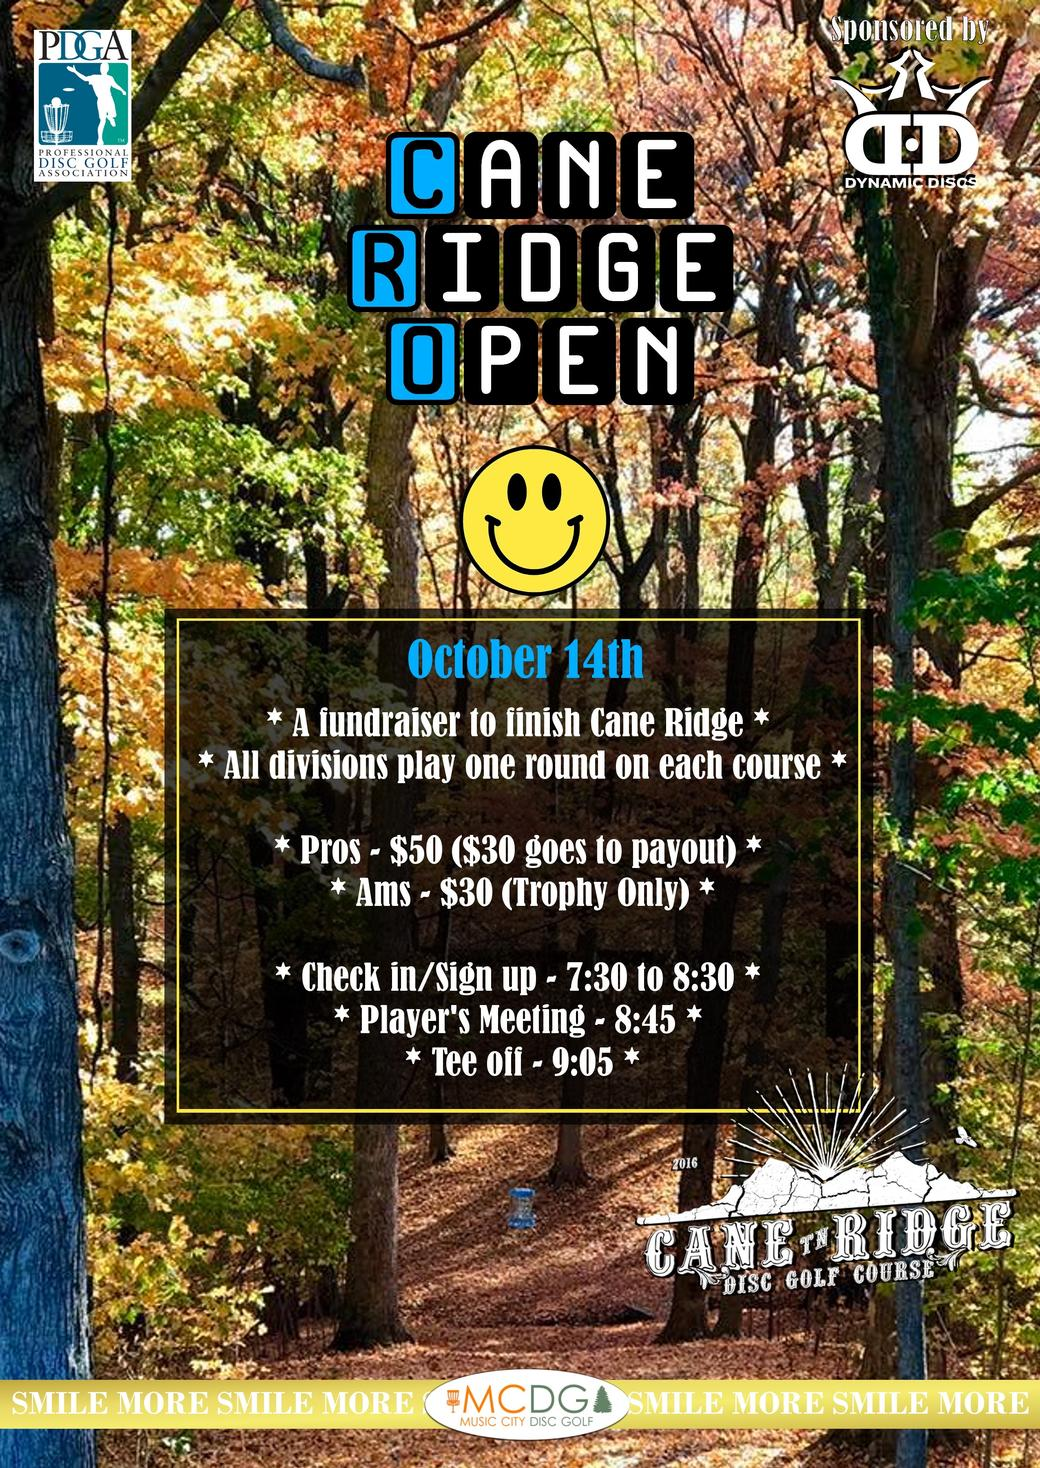 Cane Ridge Open Flyer 2018